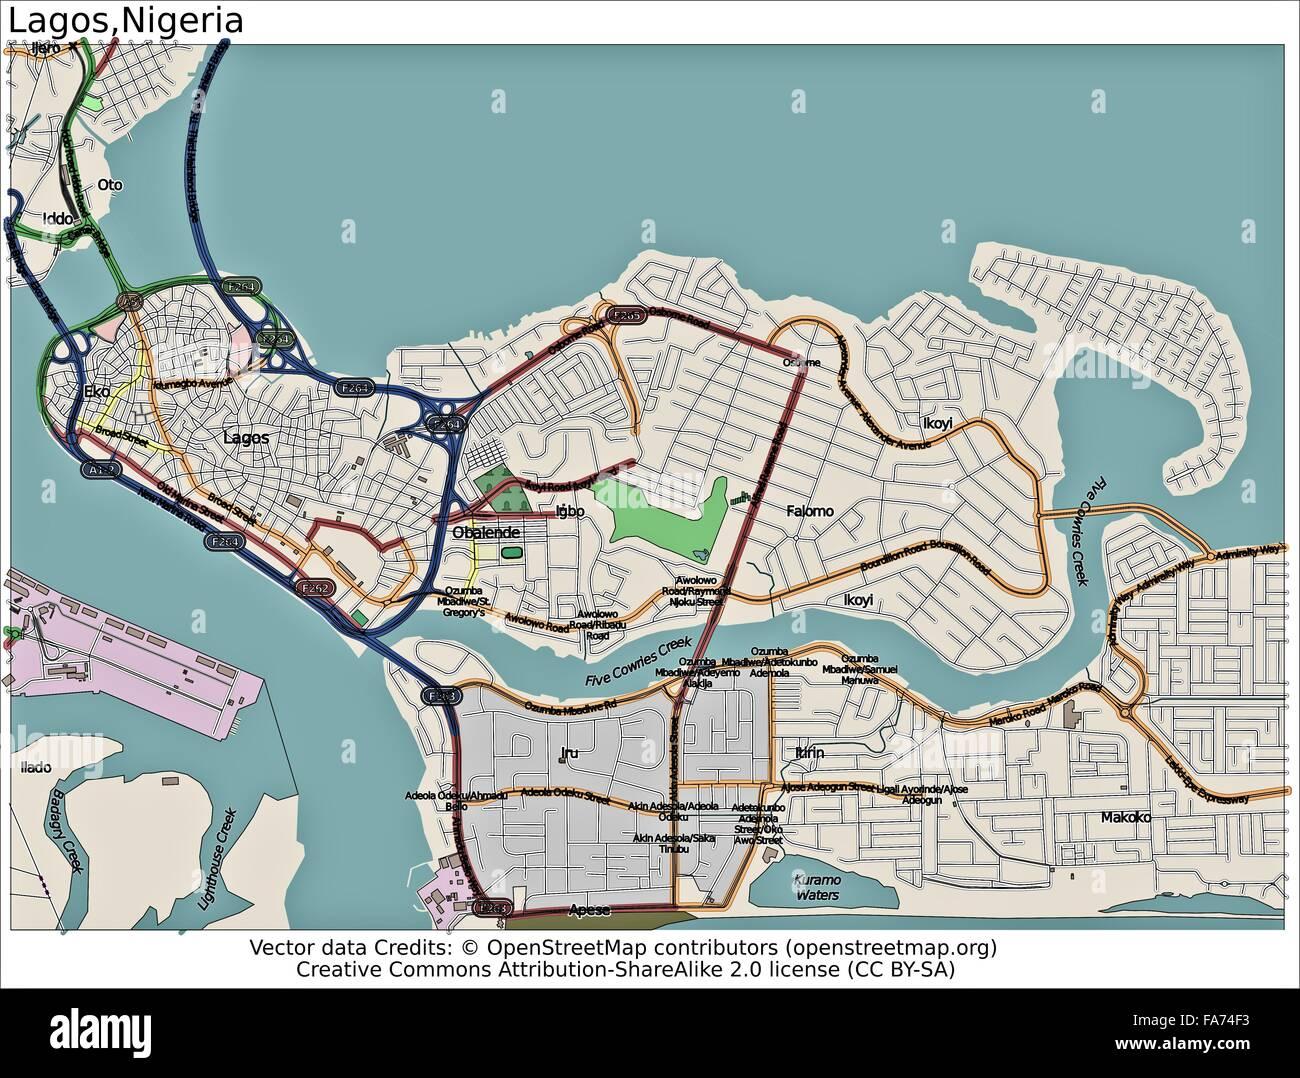 Lagos nigeria location map stock photo royalty free image lagos nigeria location map sciox Choice Image